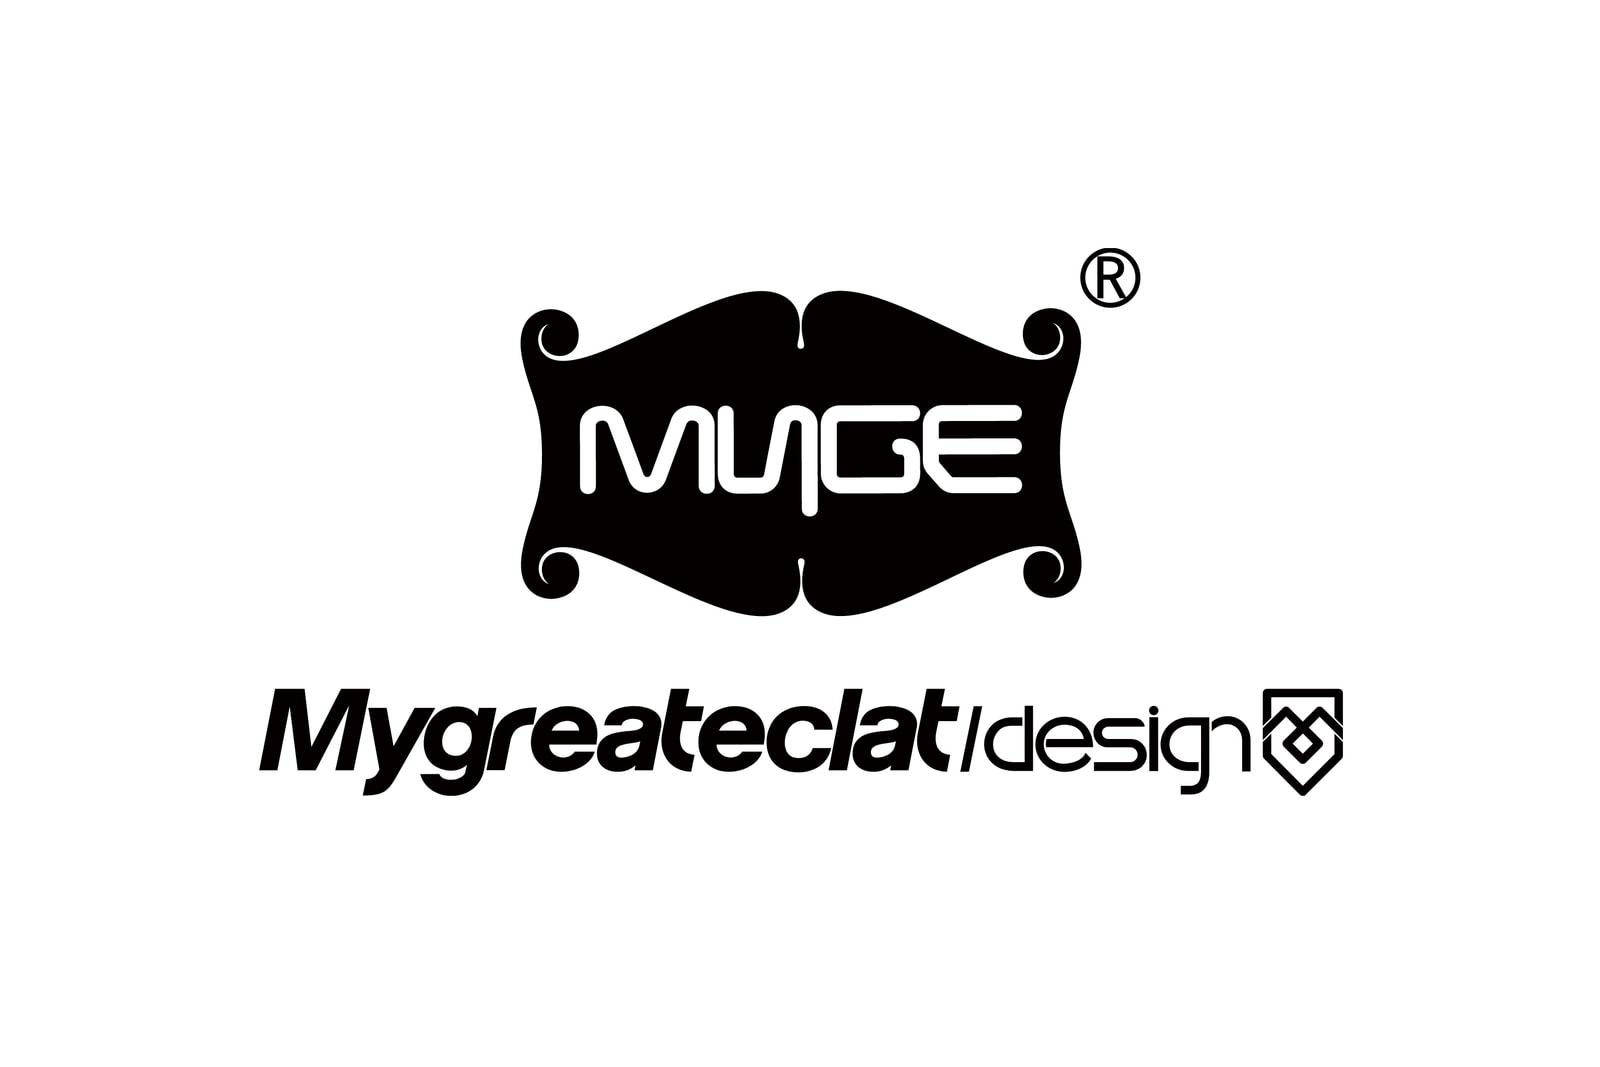 HYPEBEAST 專訪多位業內人士探討品牌 Logo 背後的價值與商業性